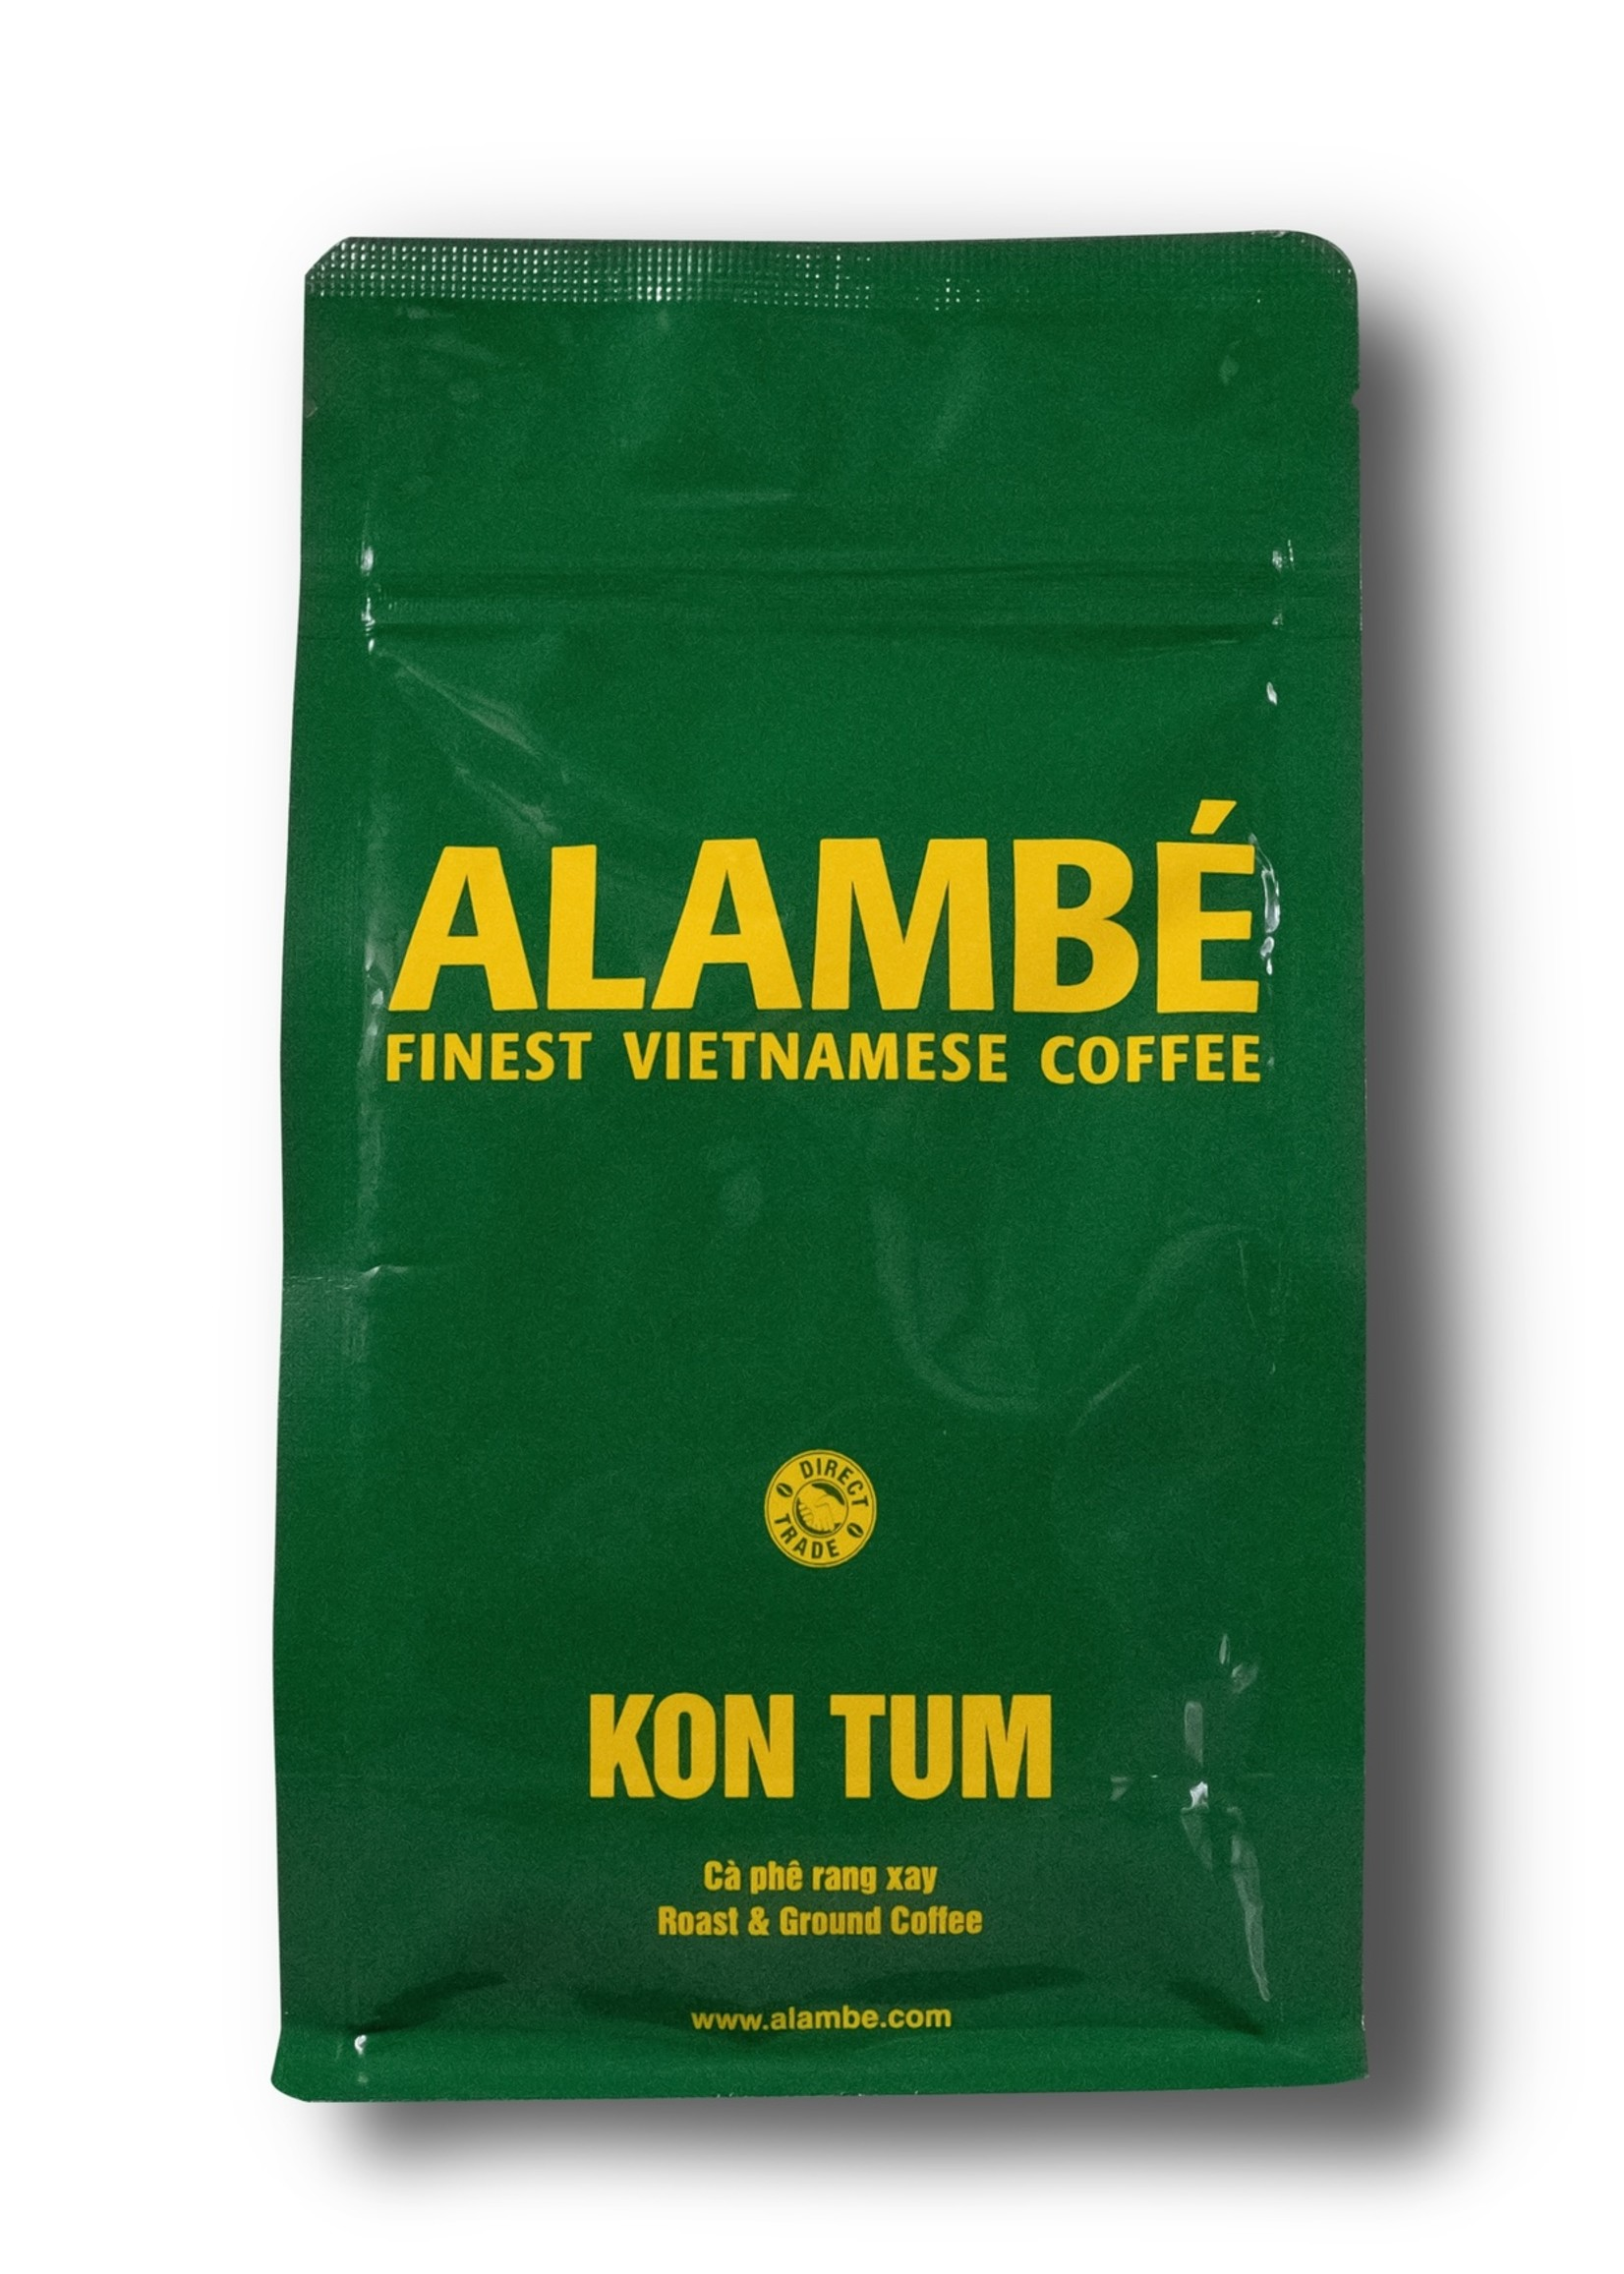 Alambé - Finest Vietnamese Coffee Kon Tum - 100% «honey-processed» Robusta aus Vietnam (230g gemahlen)